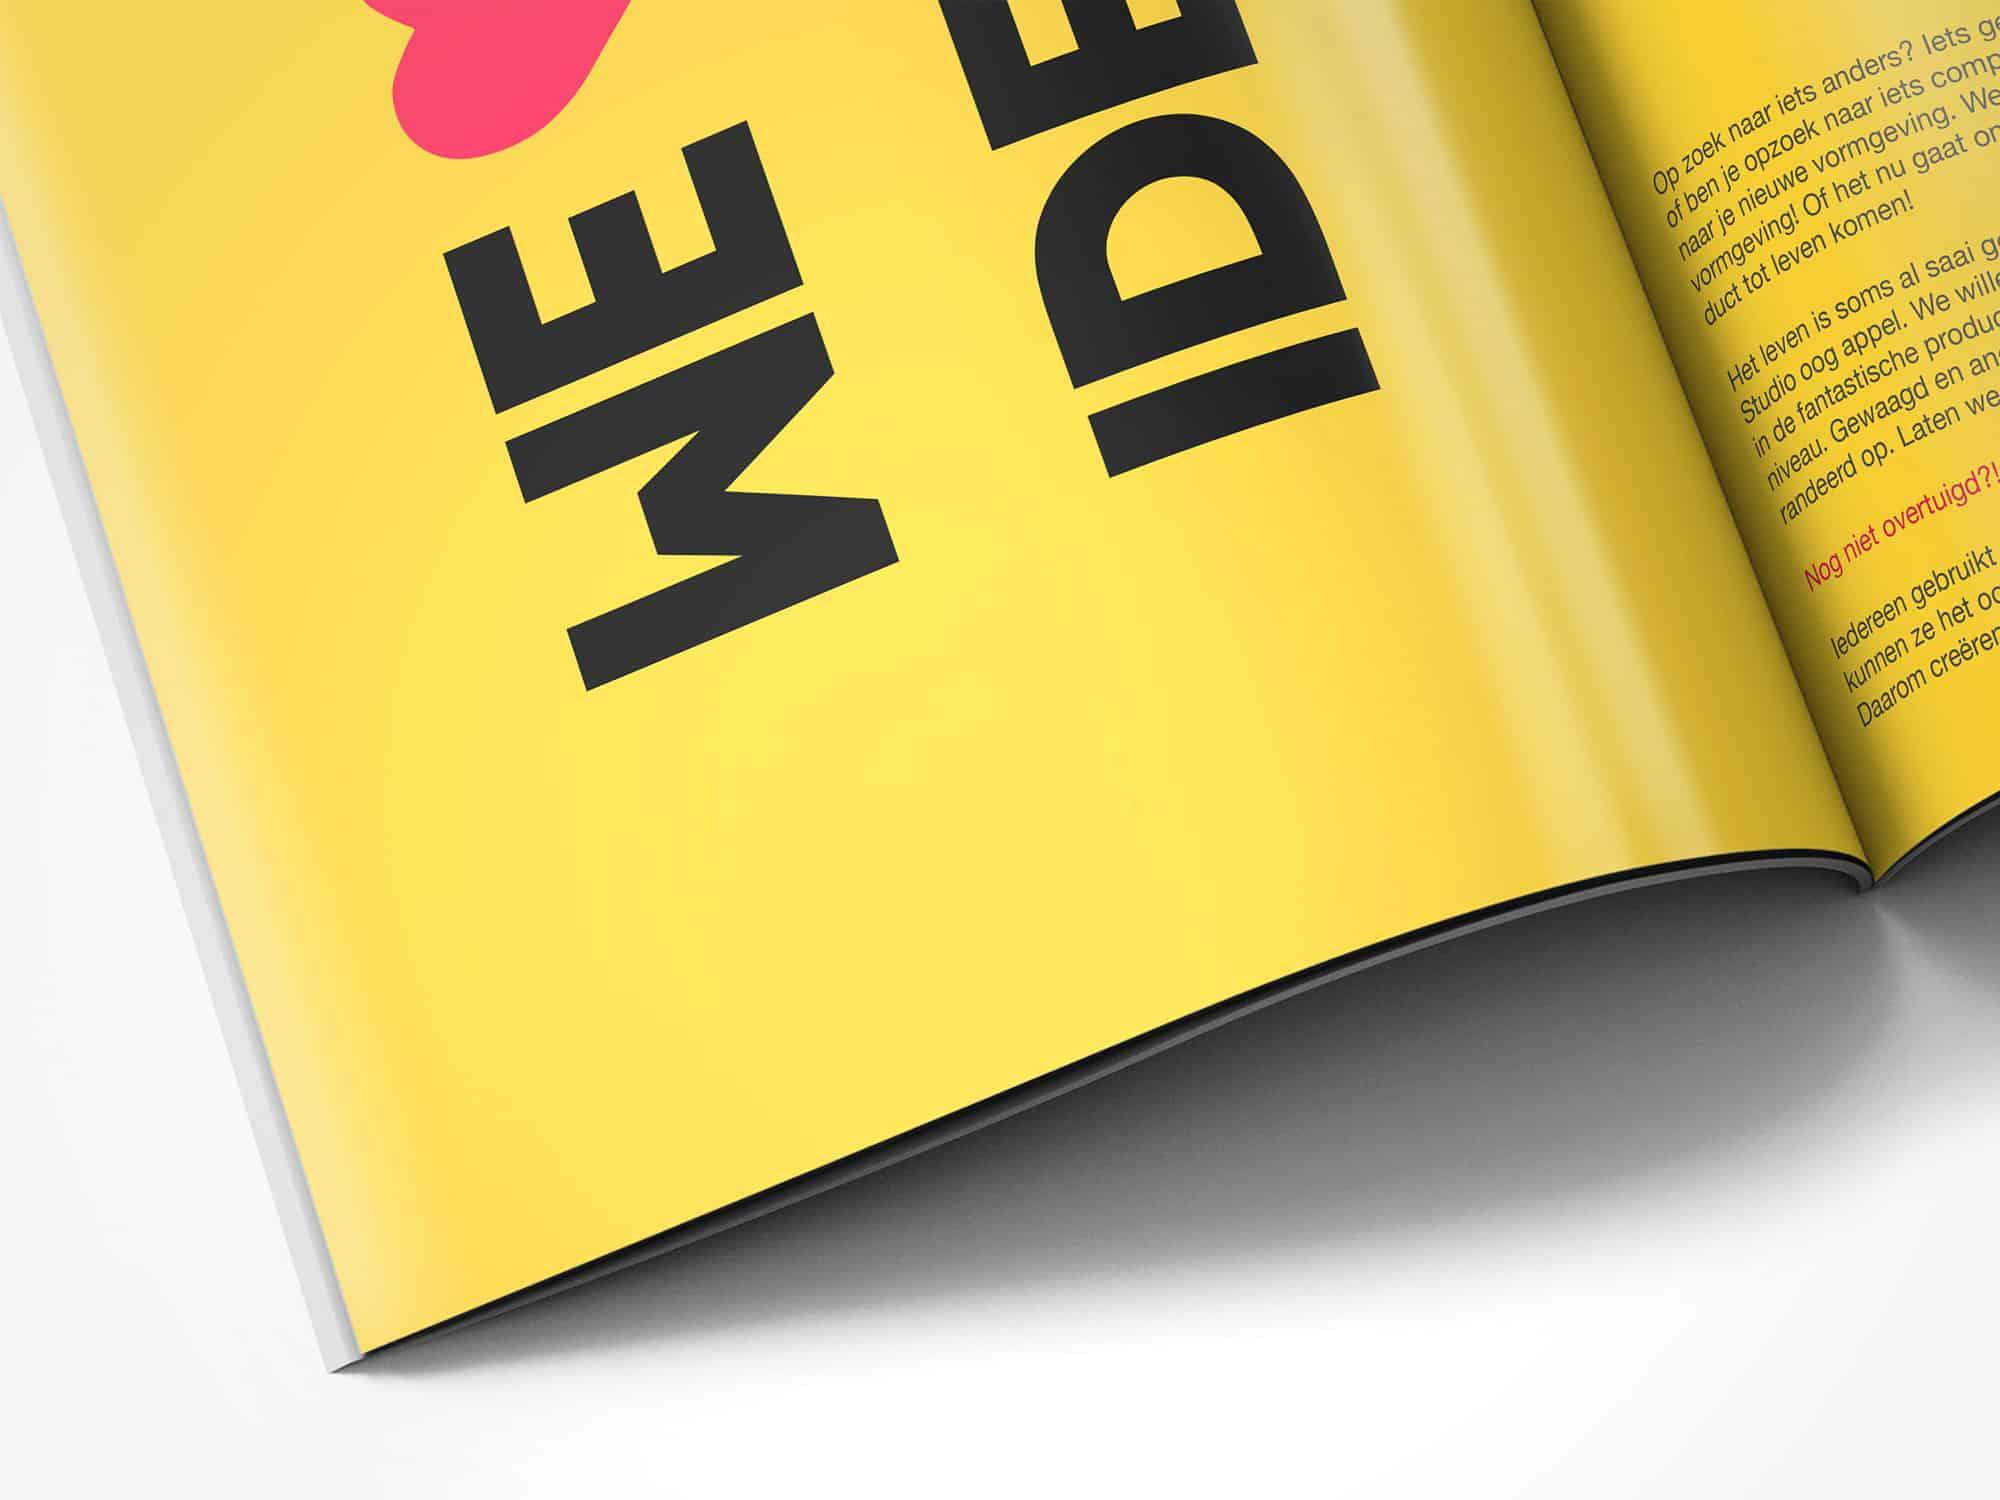 Studio oog appel magazine